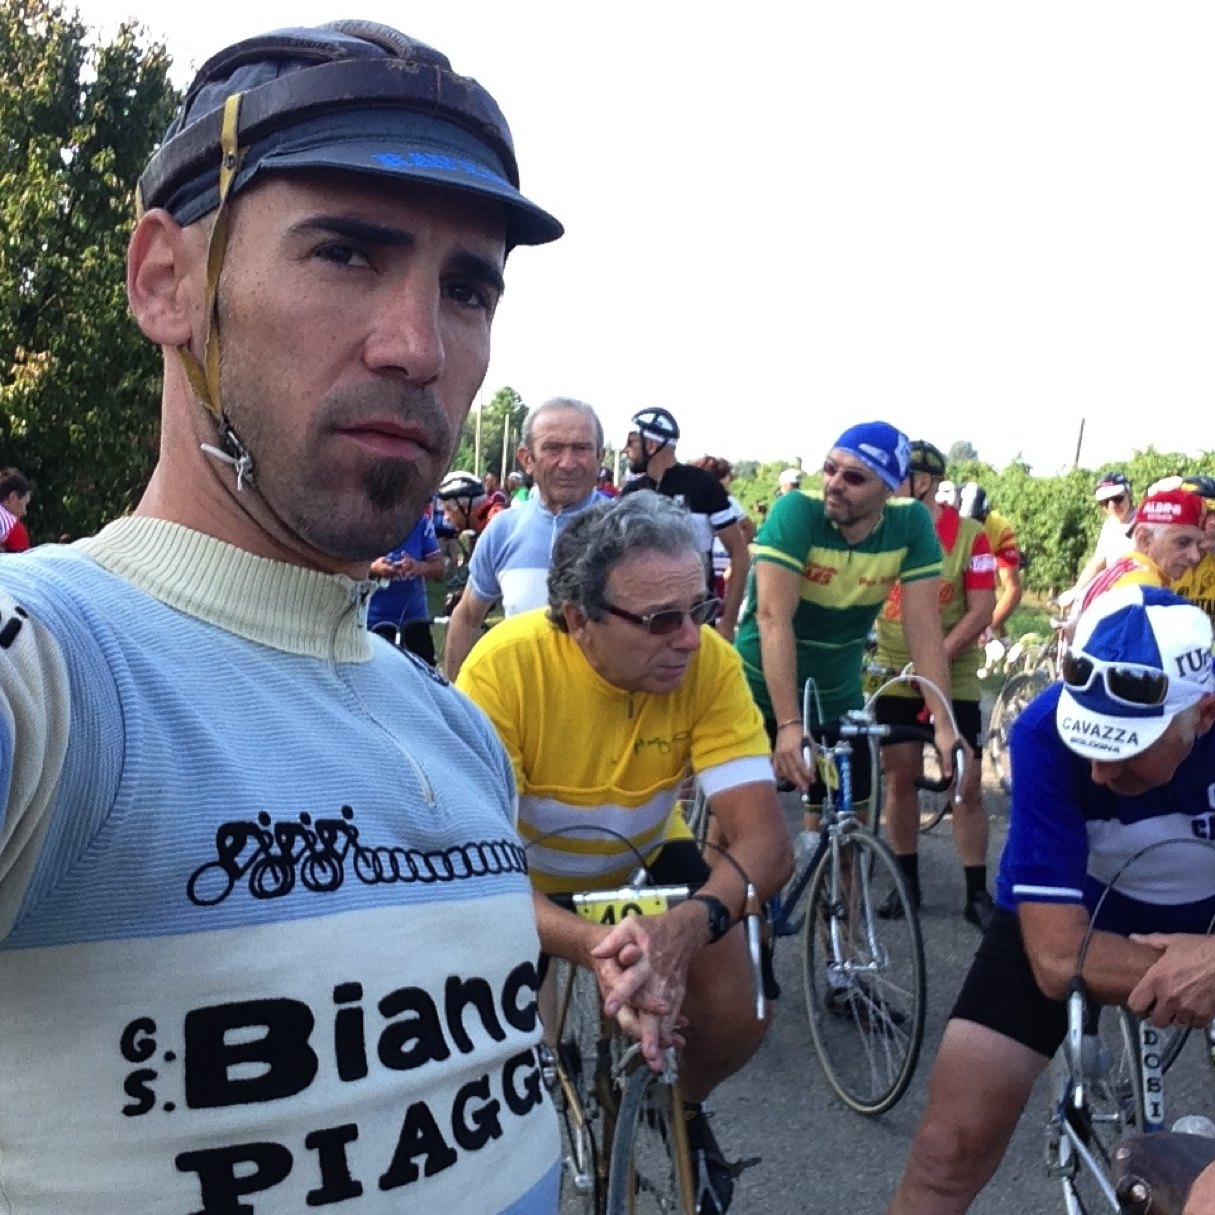 salatissimo - bike eroica Lugo